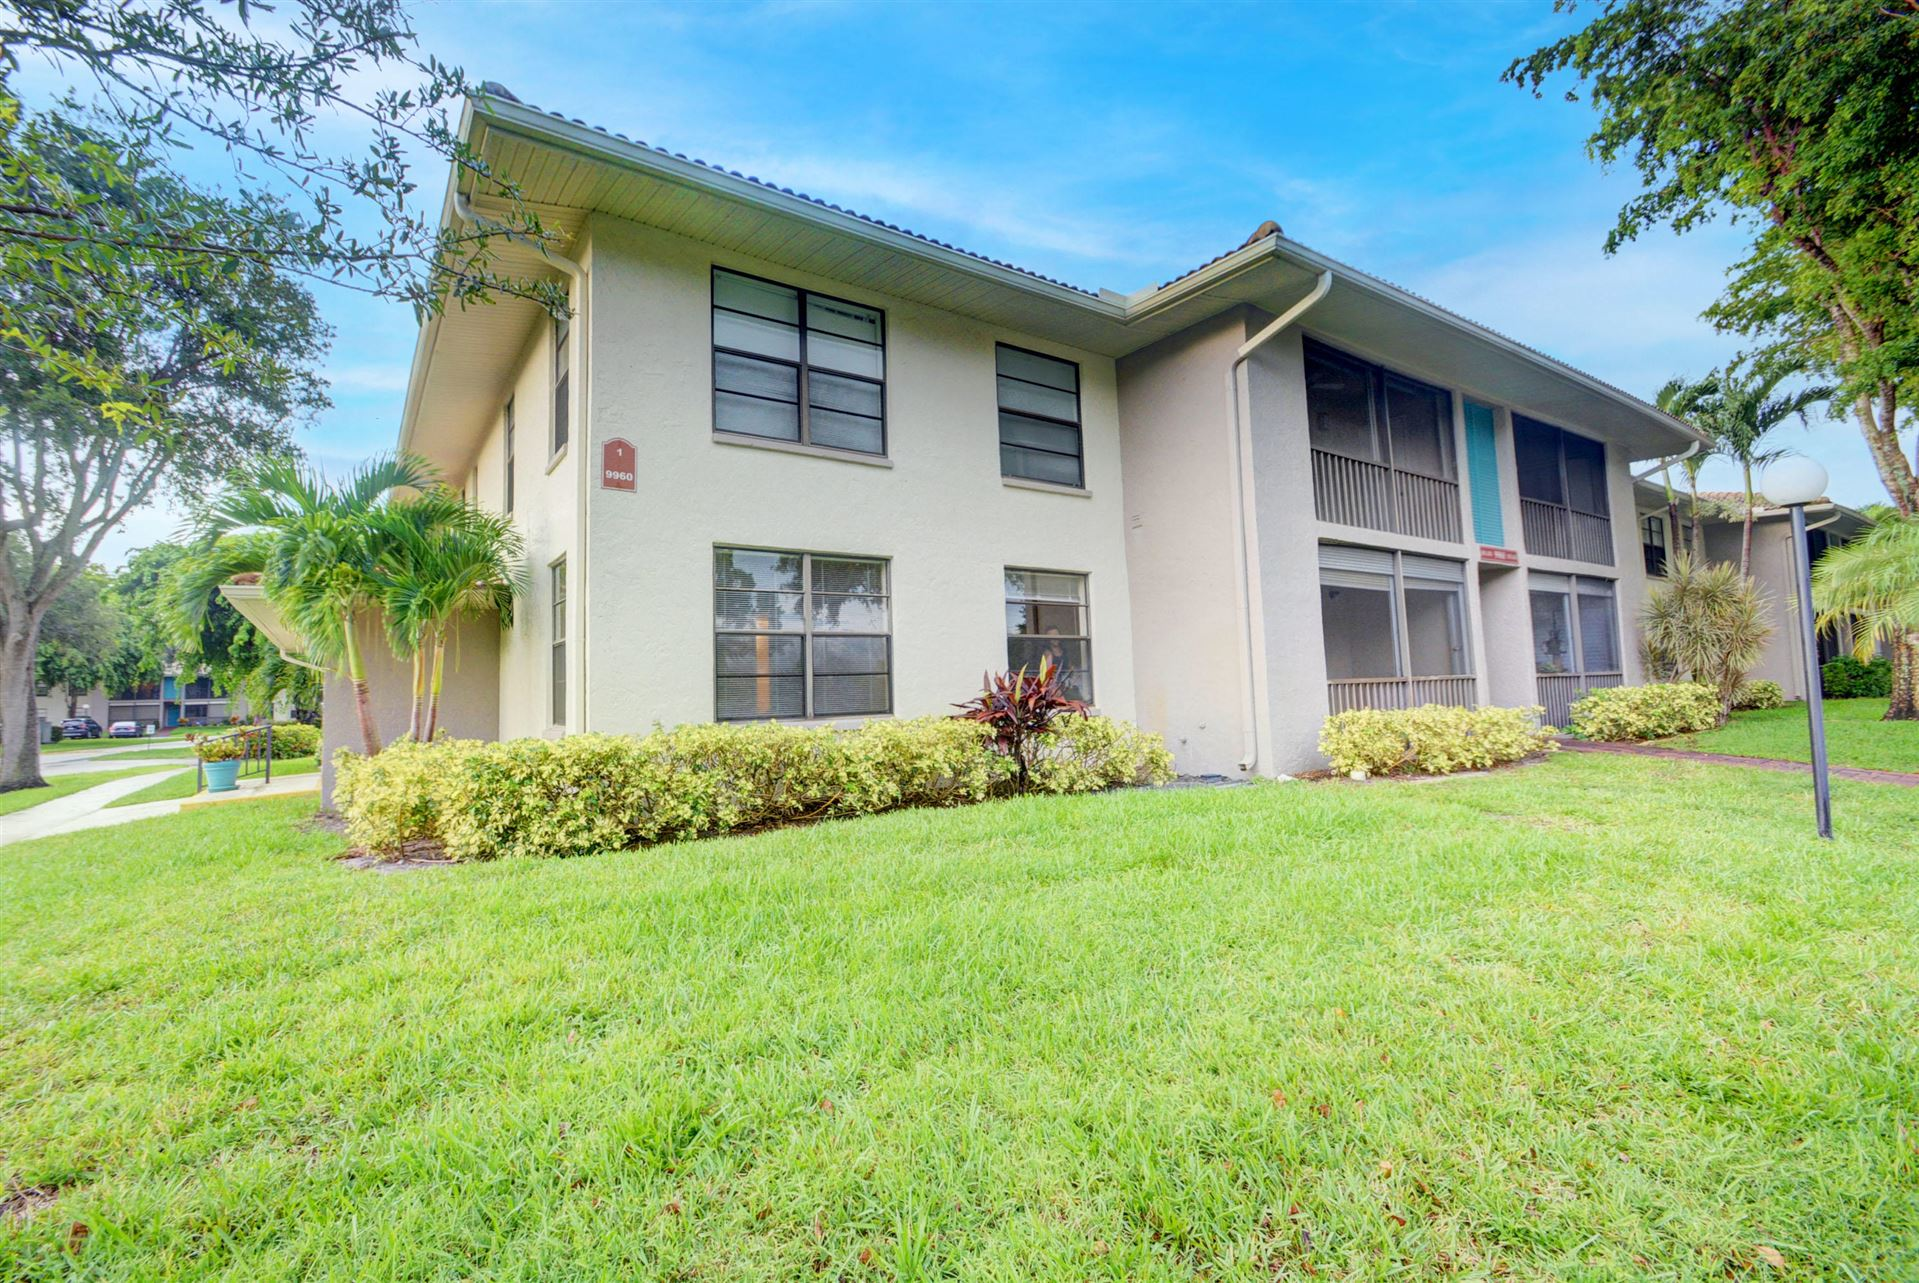 9960 Pineapple Tree Drive #101, Boynton Beach, FL 33436 - MLS#: RX-10733341